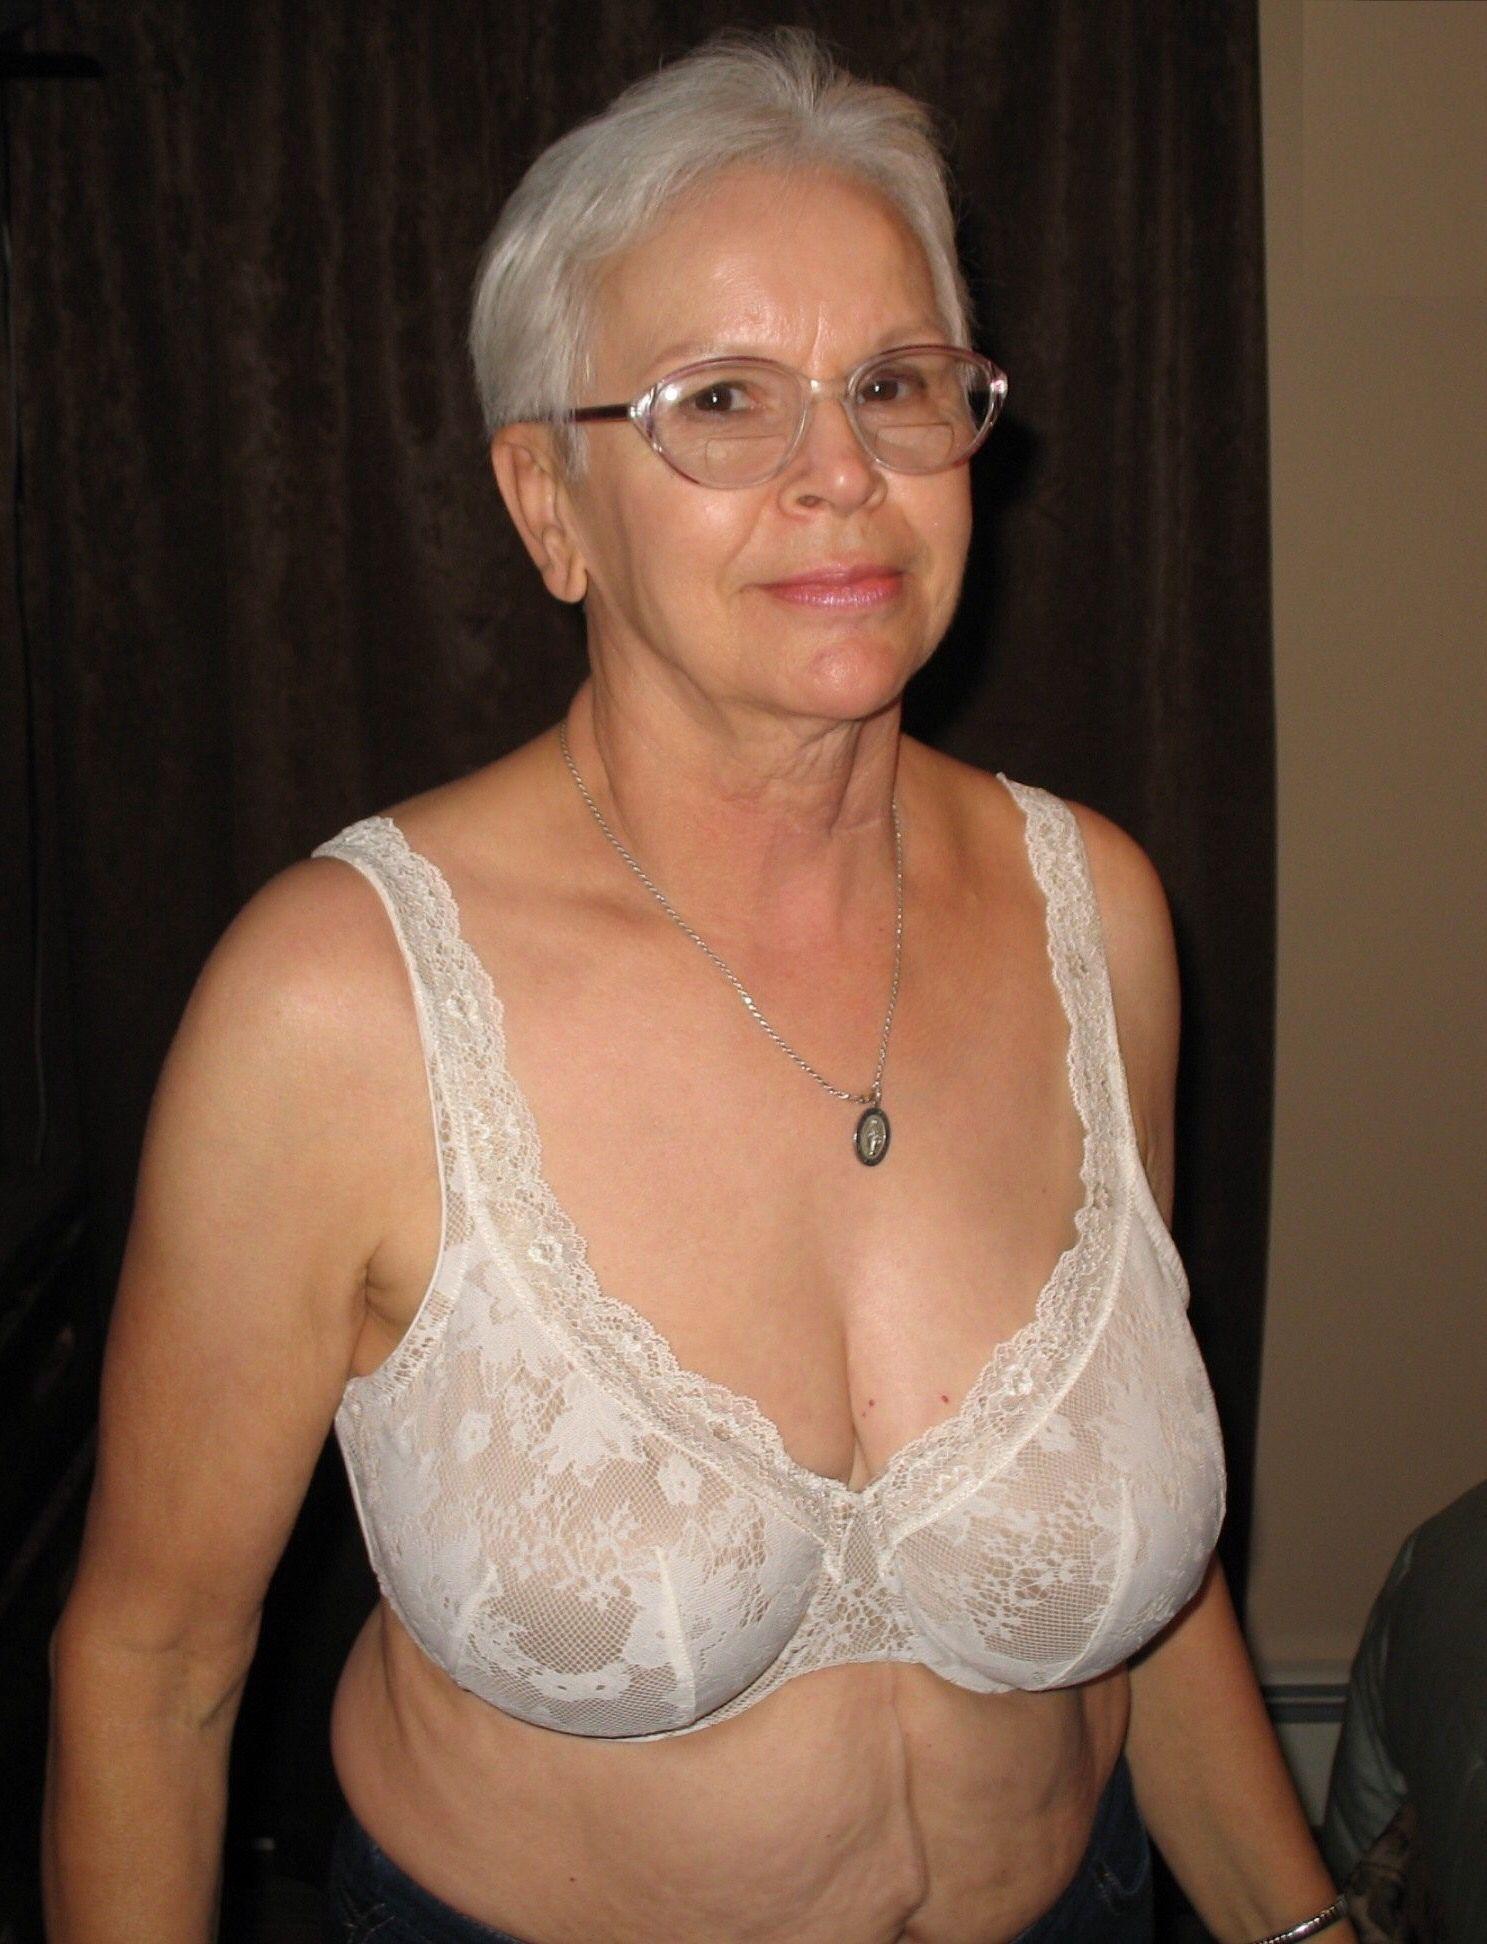 Free granny amature pictures